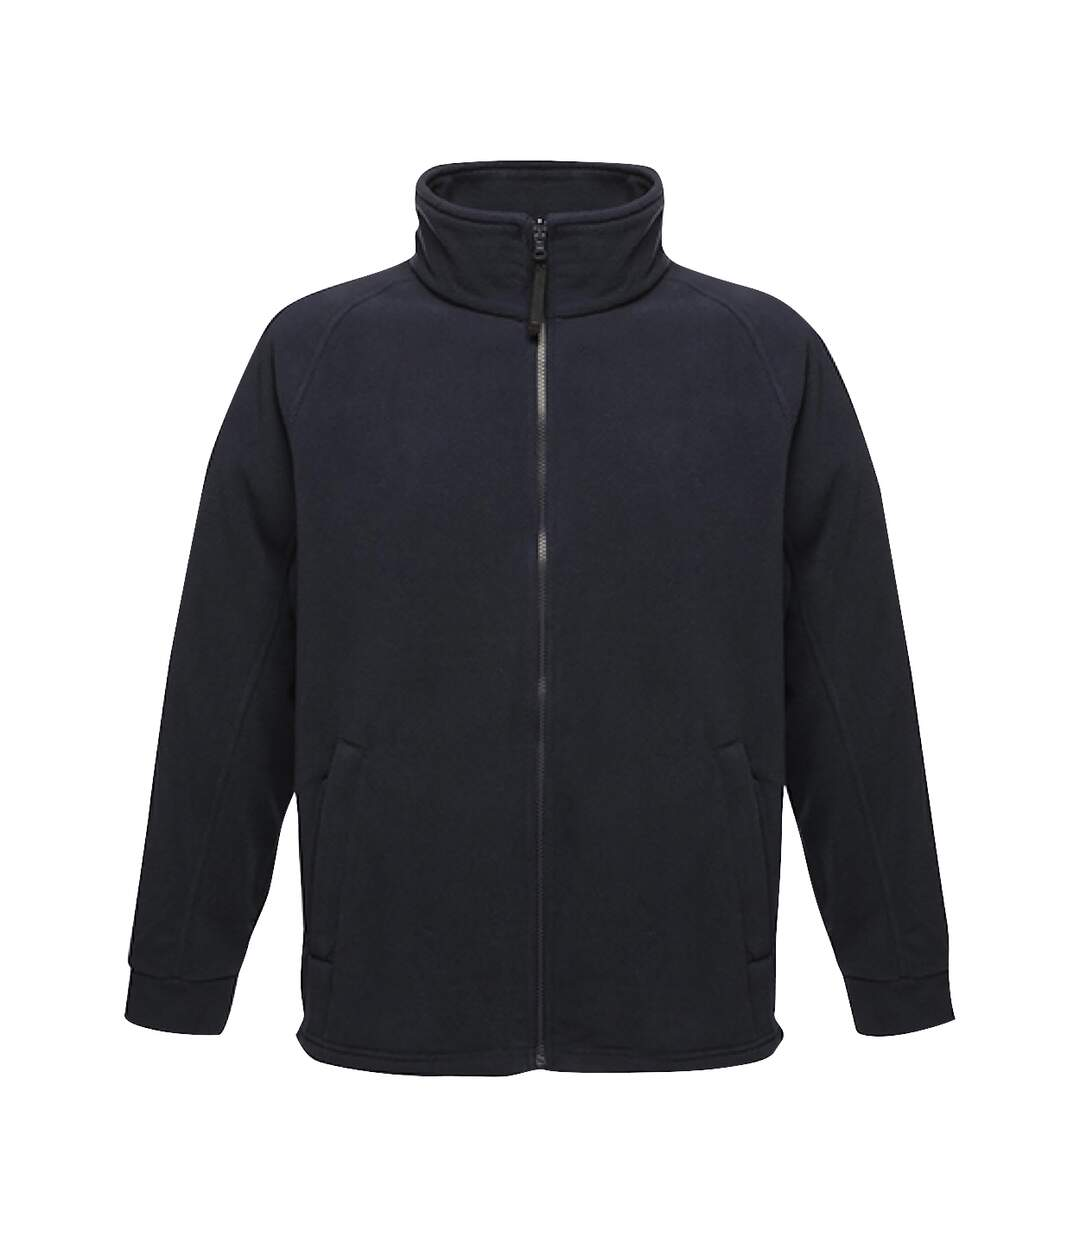 Regatta Mens Thor III Fleece Jacket (Black) - UTRG1486